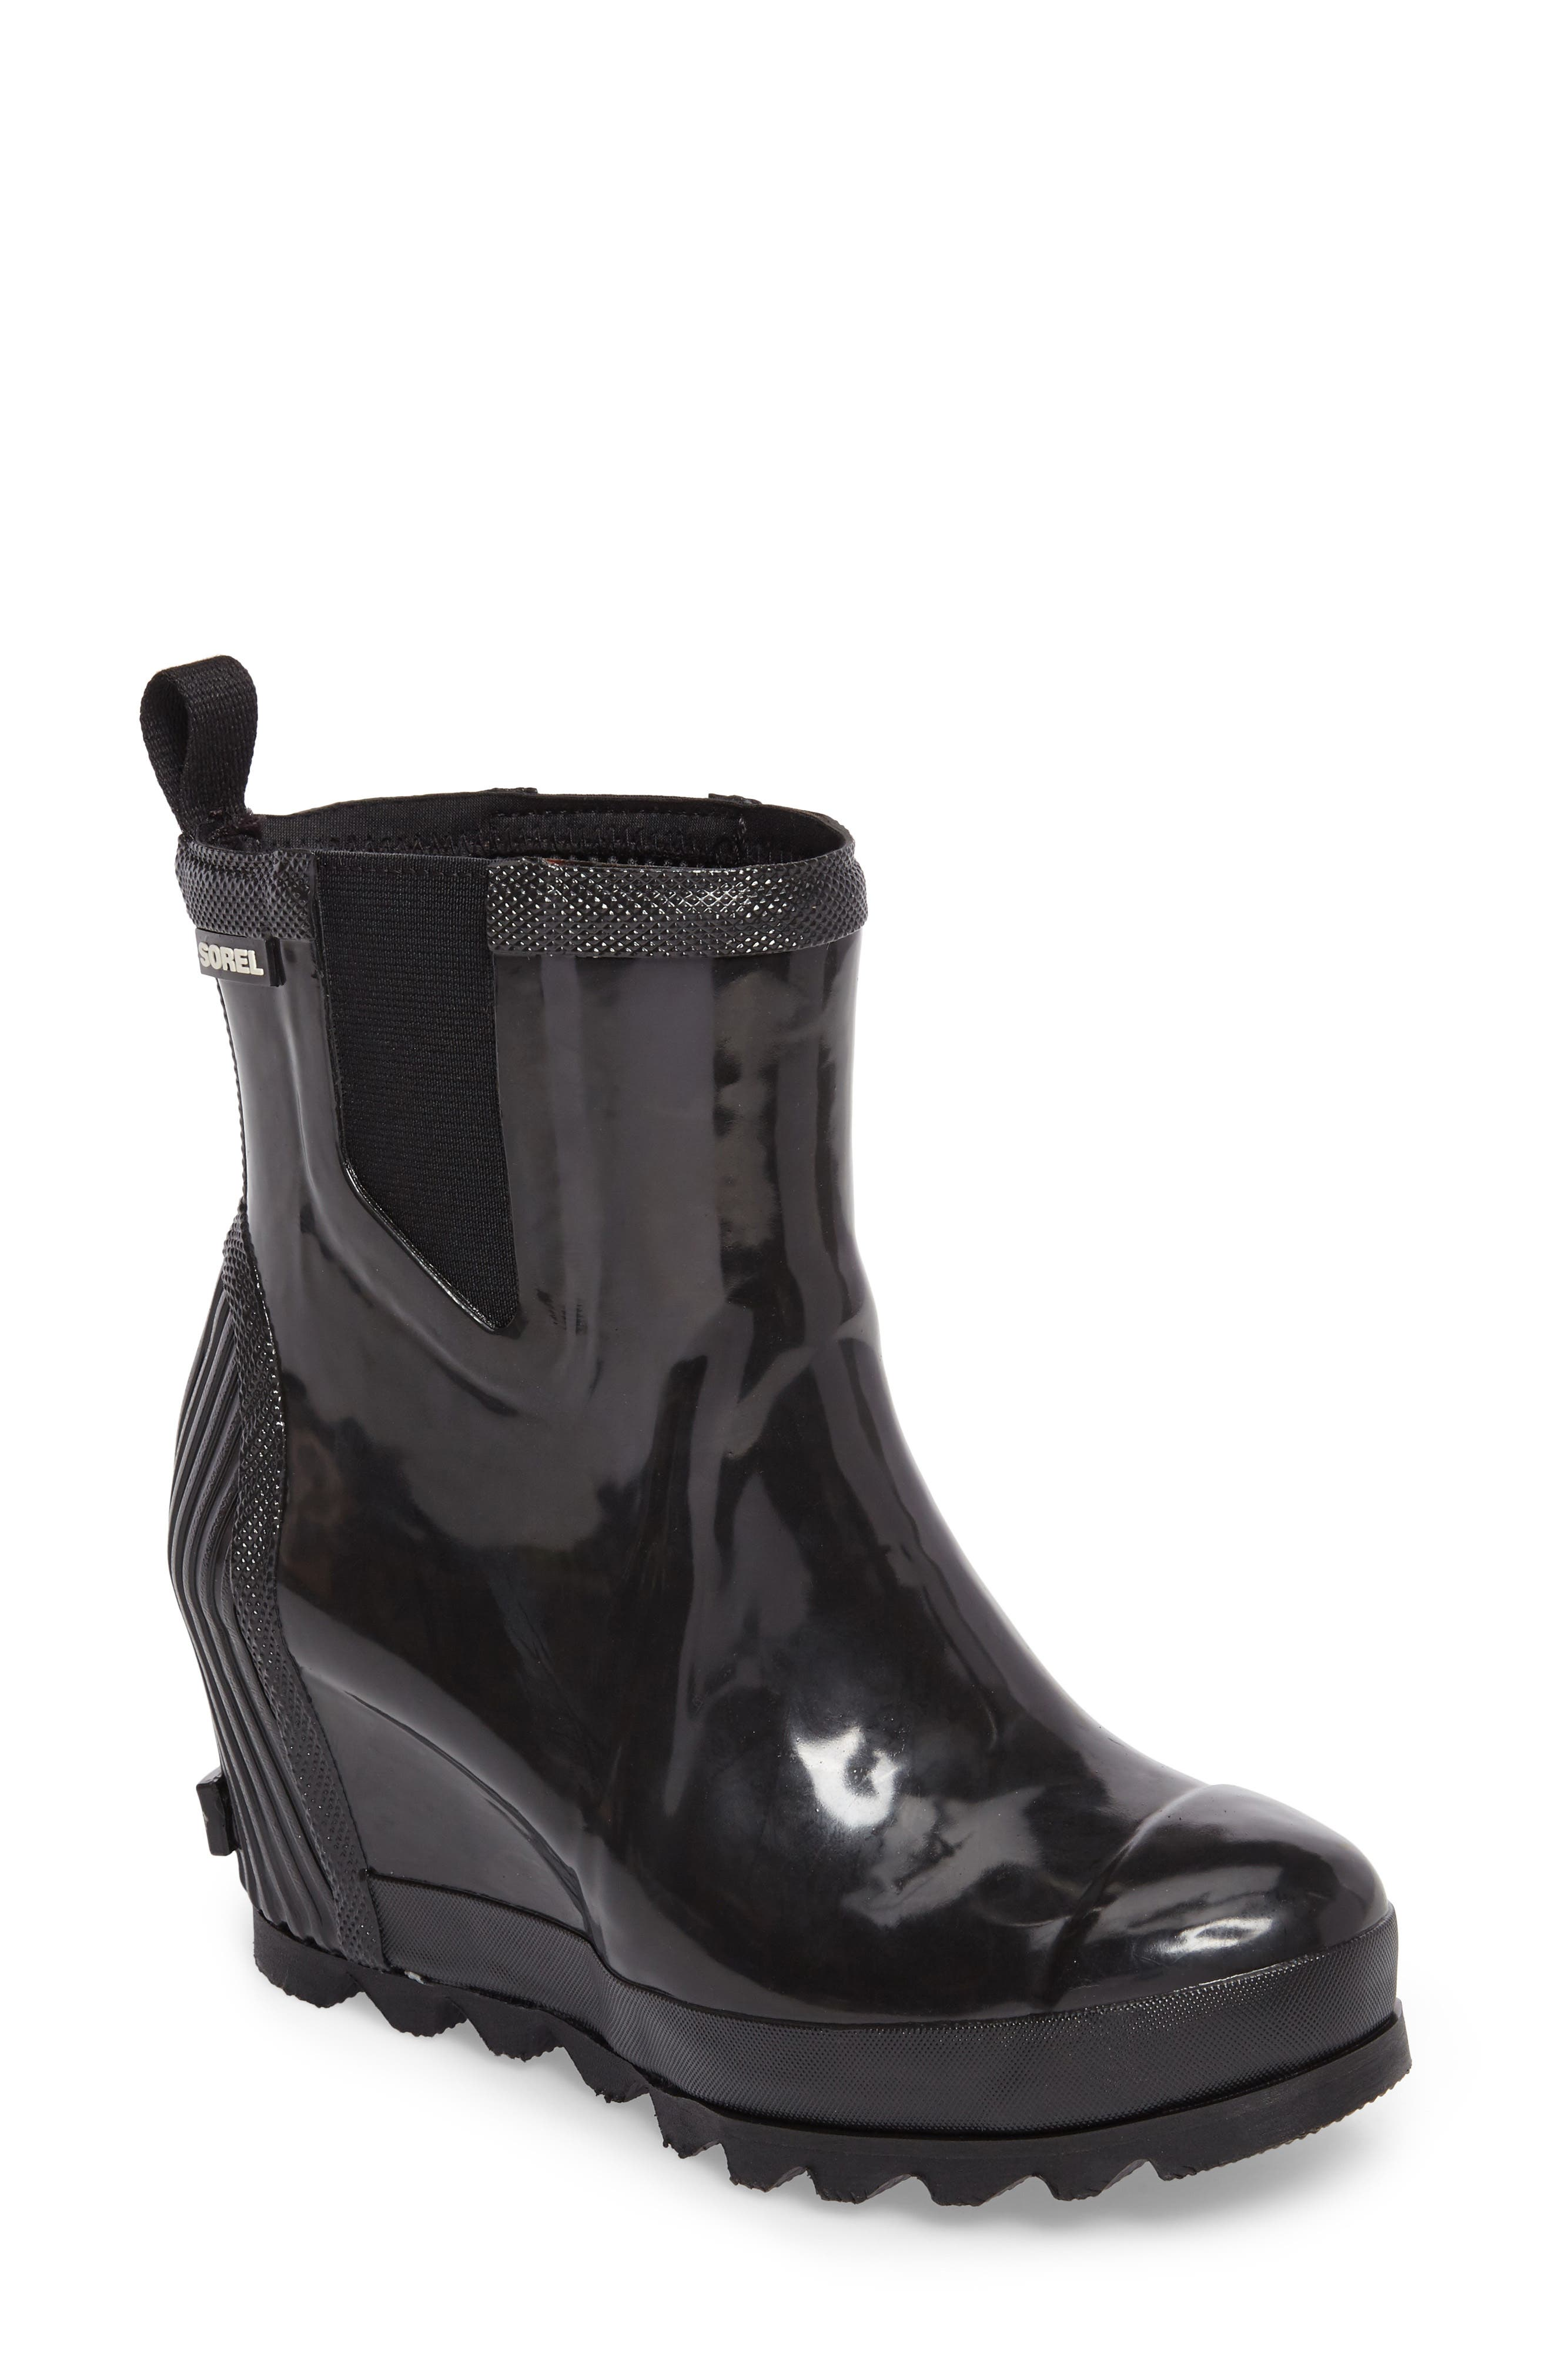 Joan Glossy Wedge Rain Boot,                         Main,                         color, Black/ Sea Salt